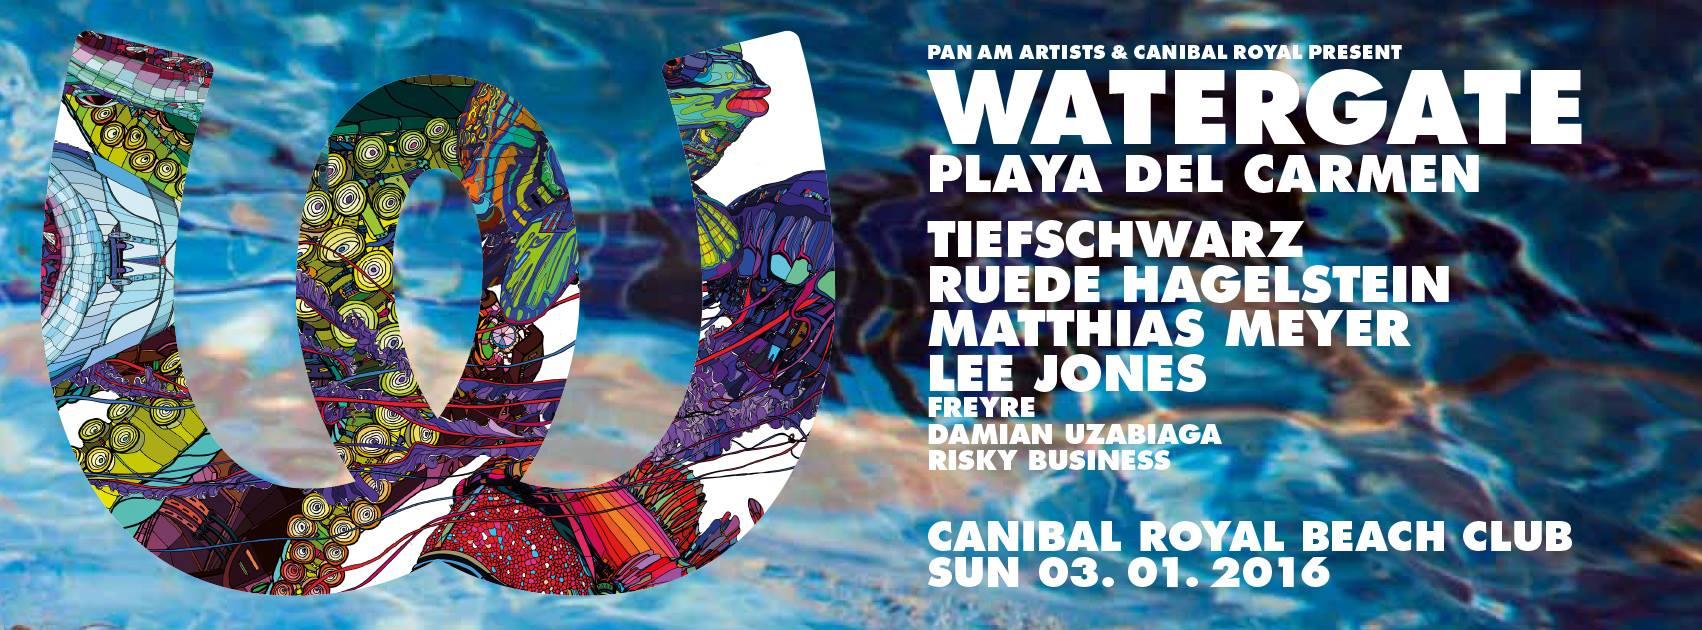 Watergate Showcase @ Canibal Royal - Playa del Carmen